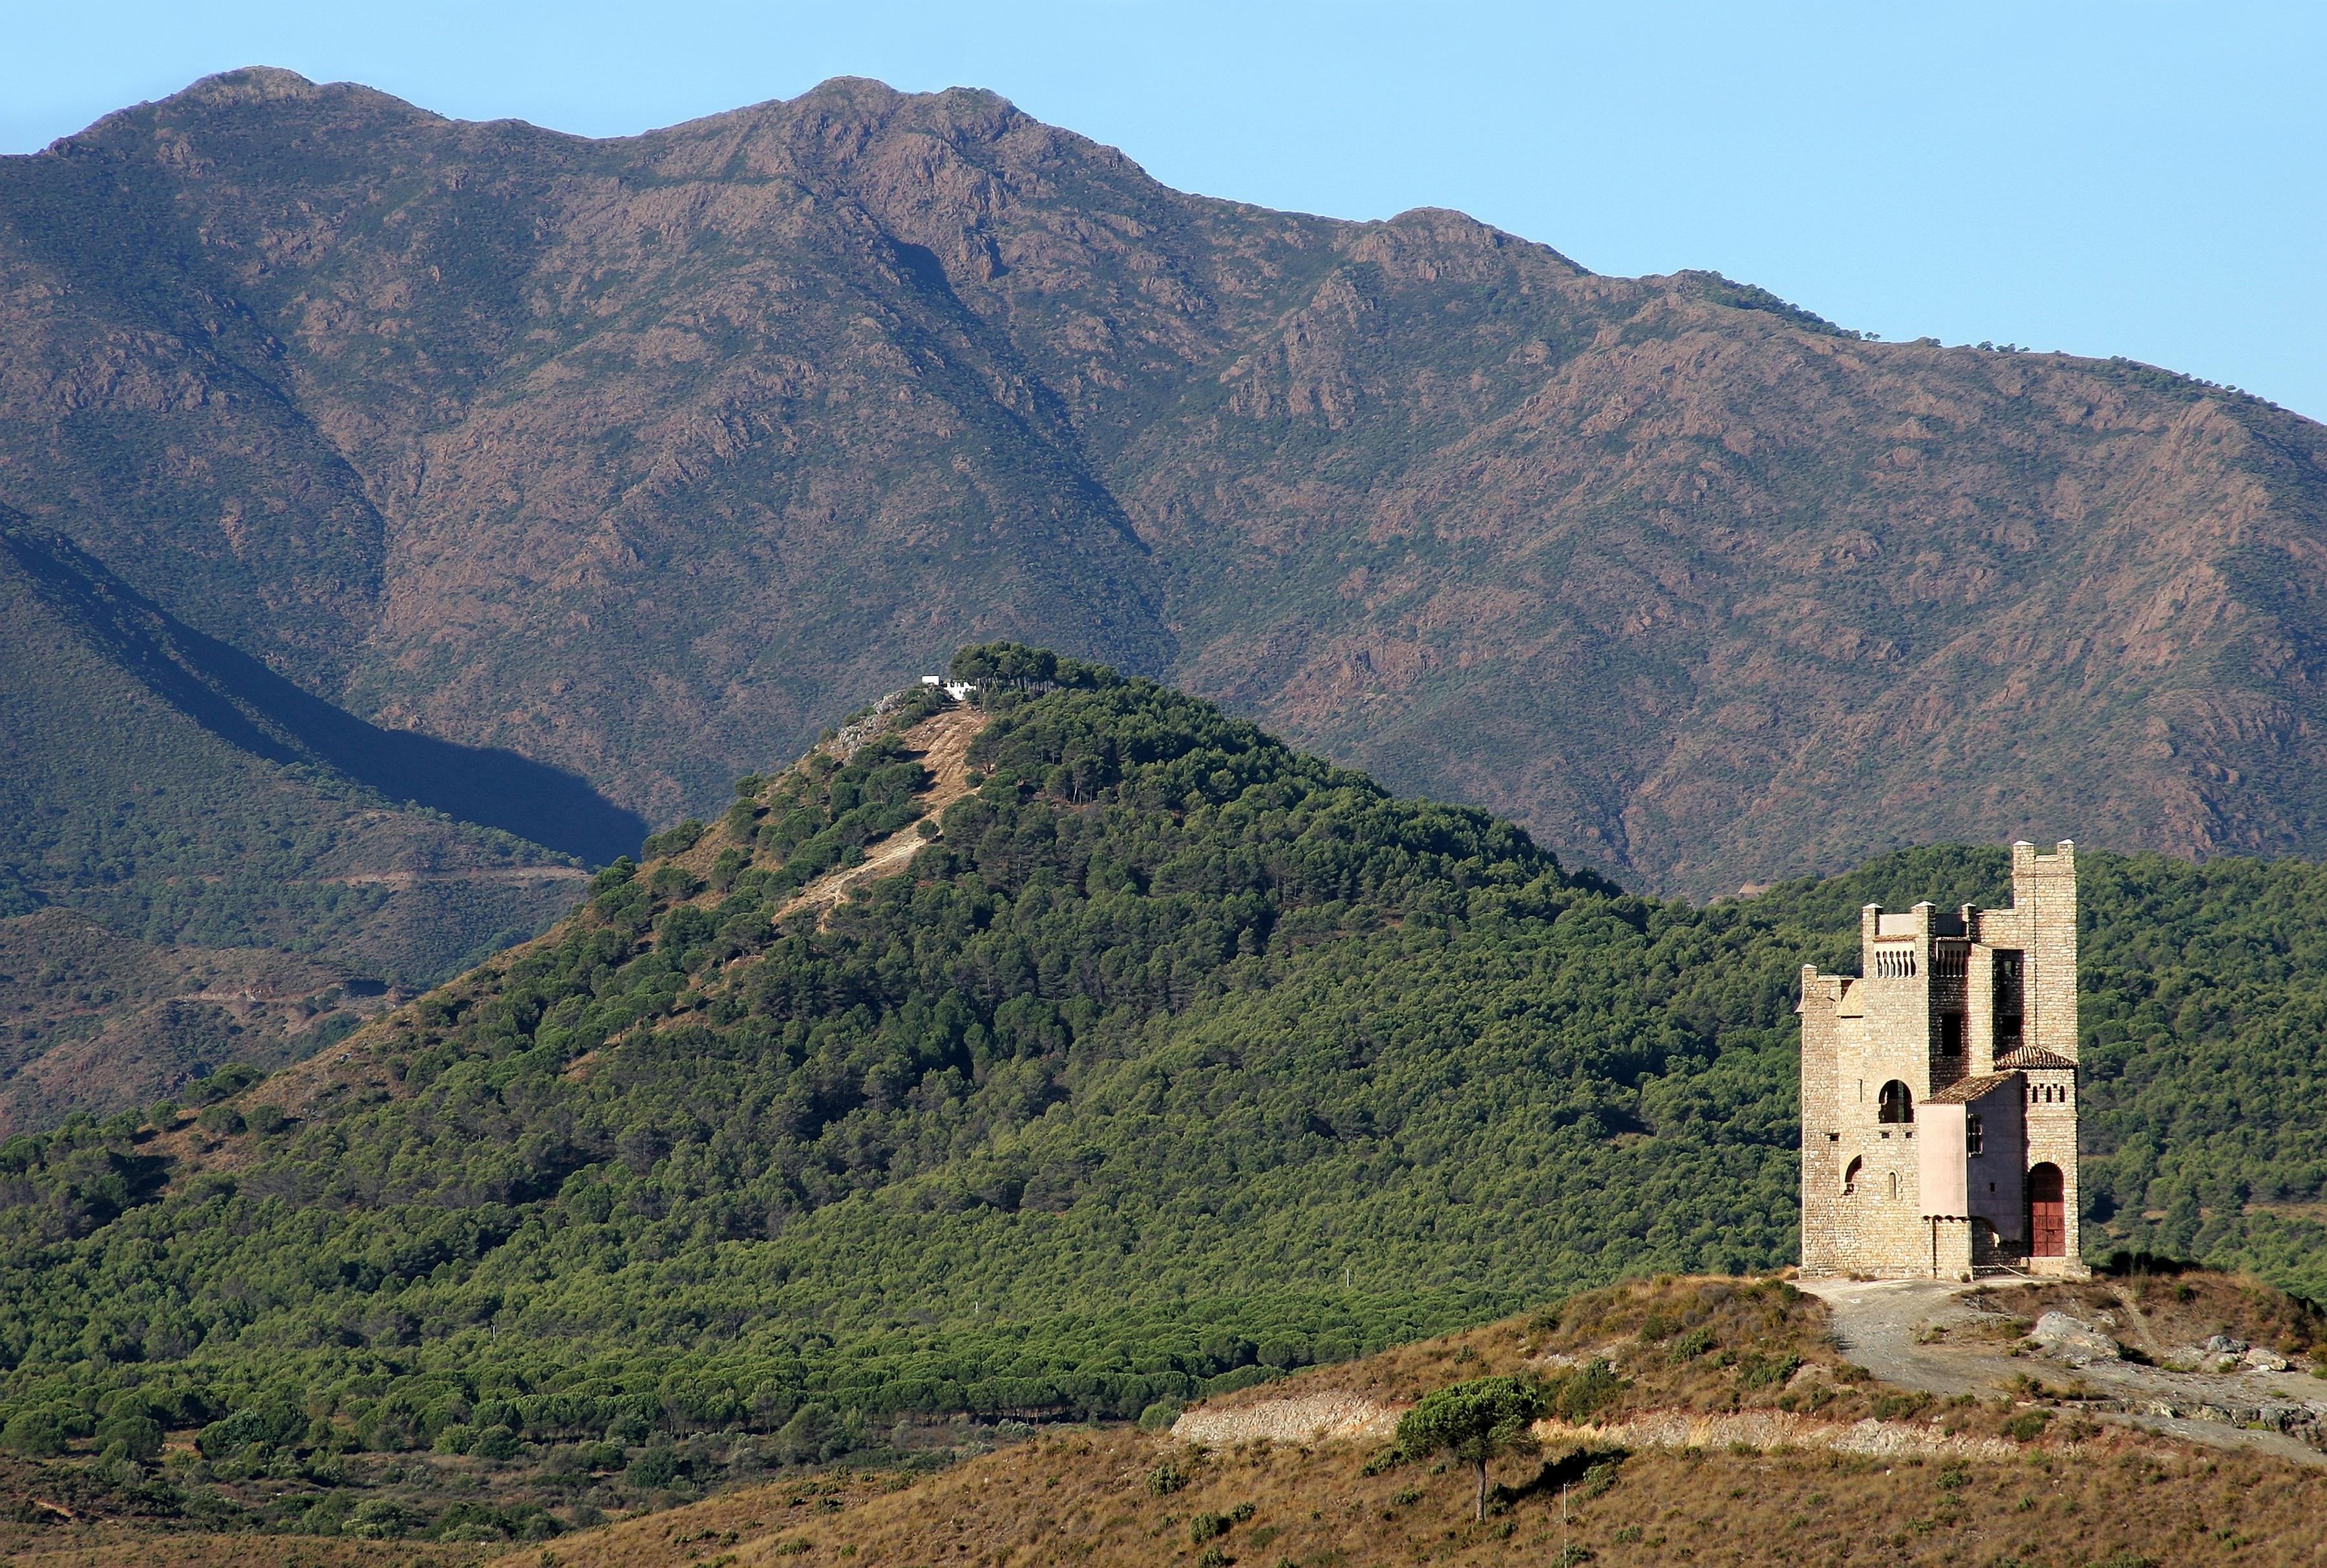 Alhaurin el Grande, Andalusia, Spain